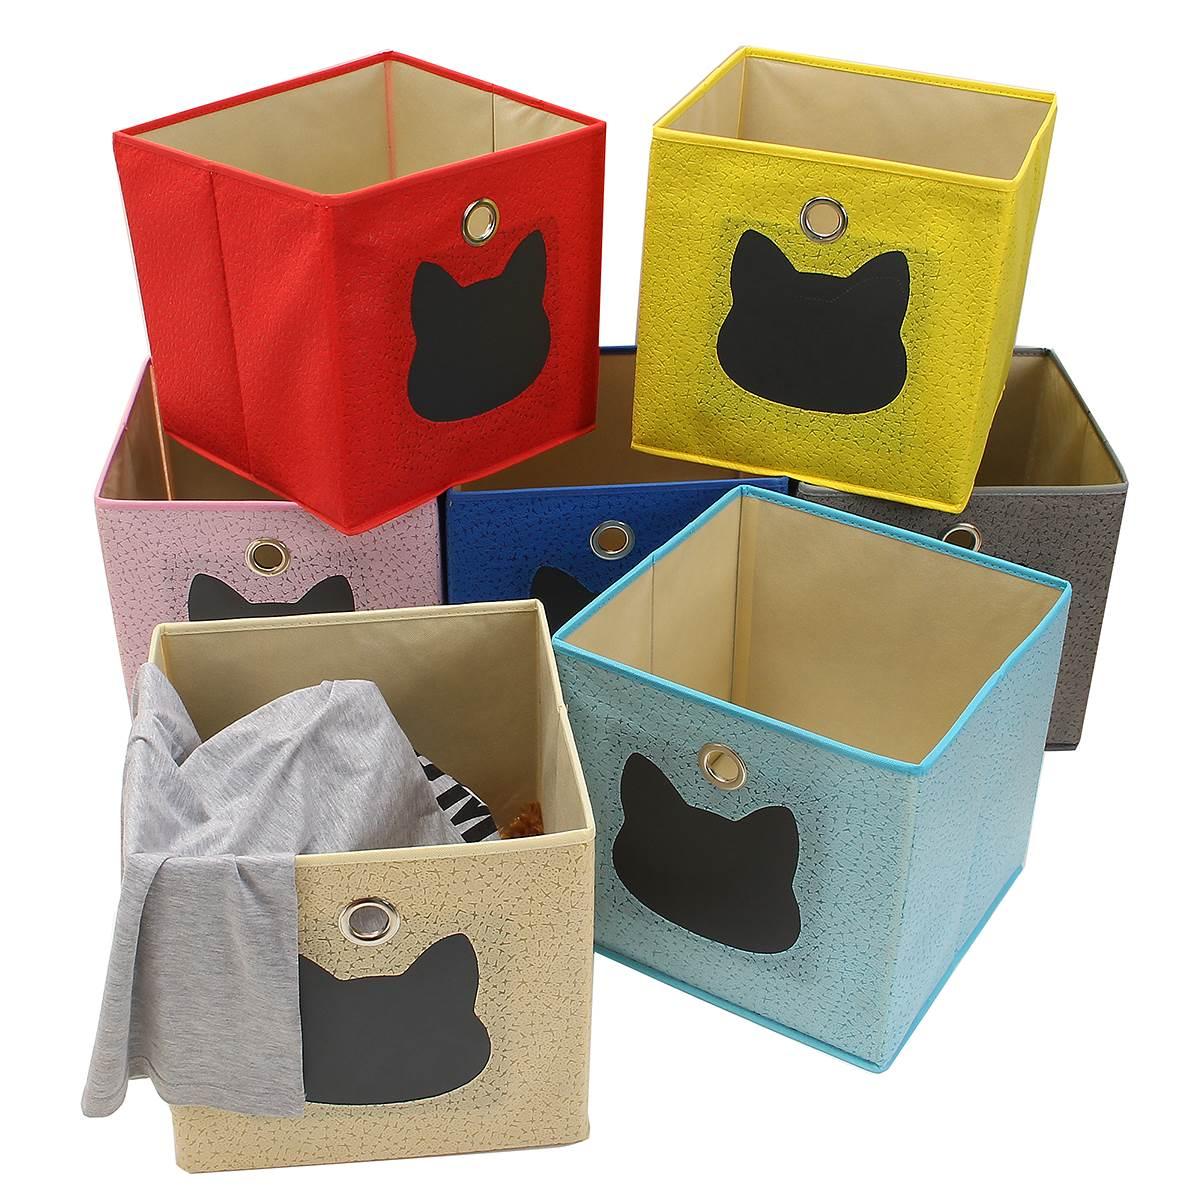 Non Woven Collapsible Kids Toys Storage Boxes Children Toys Storage Box Bin  Home Playroom Sundries Organizer